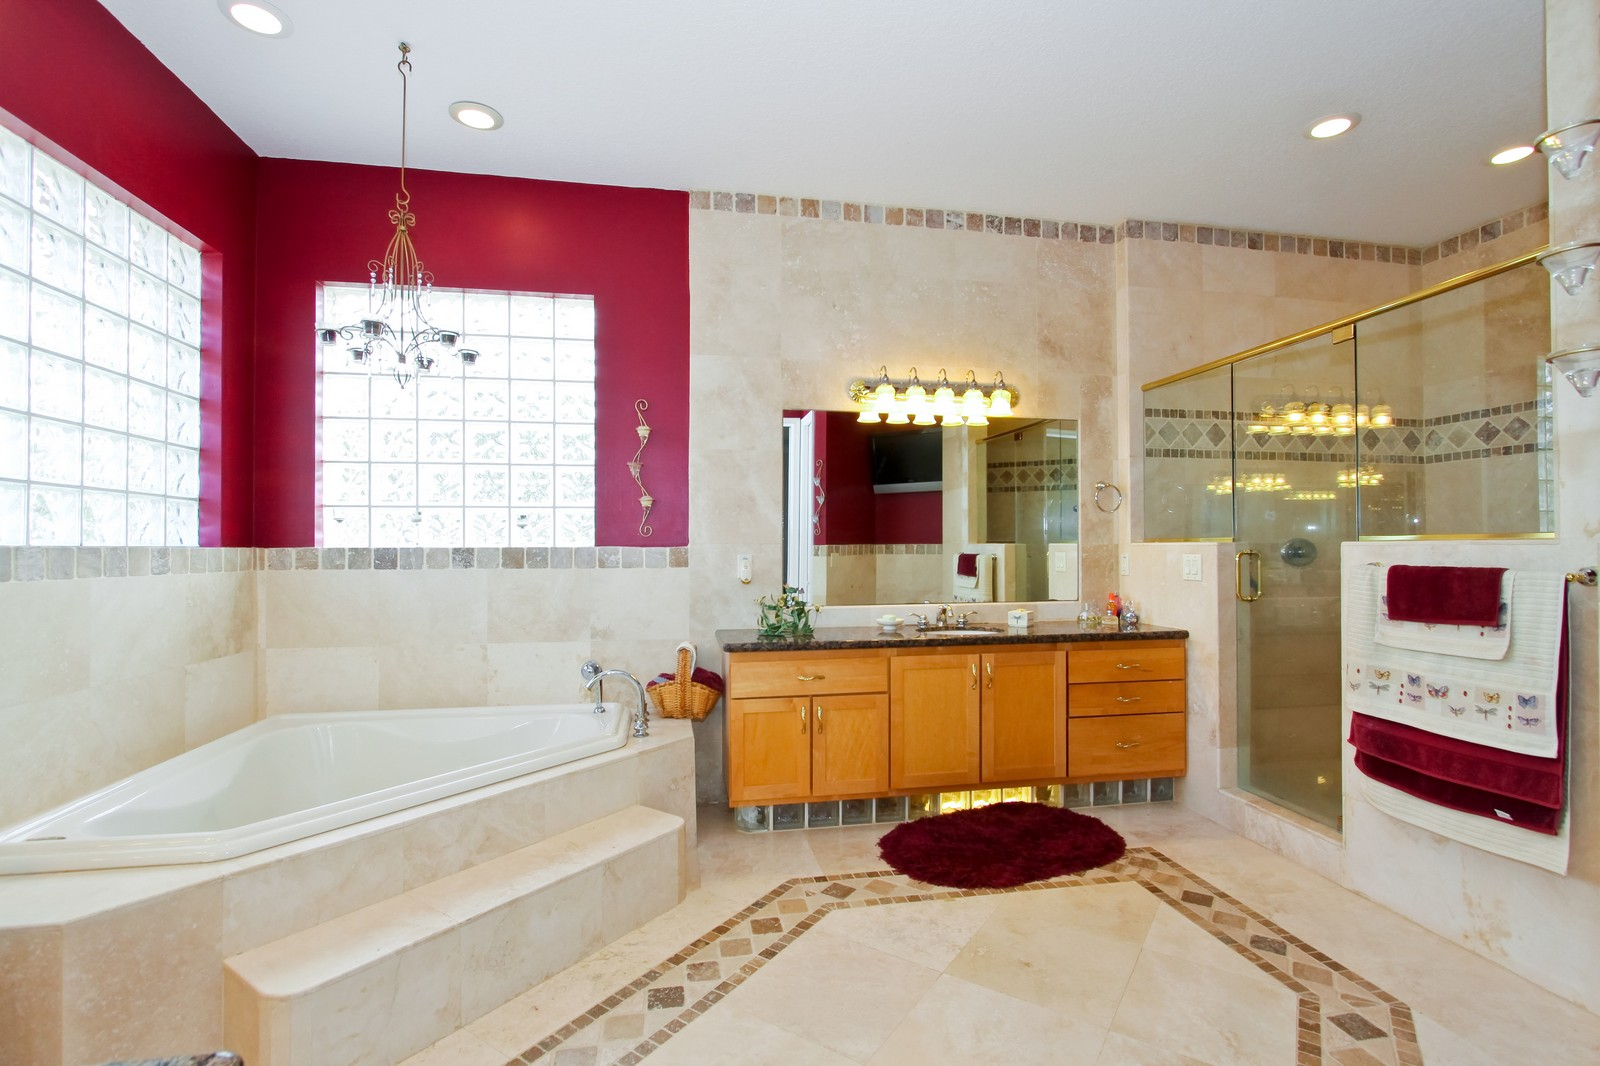 Real Estate Photography - 14542 Draft Horse Ln, Wellington, FL, 33414 - Master Bathroom